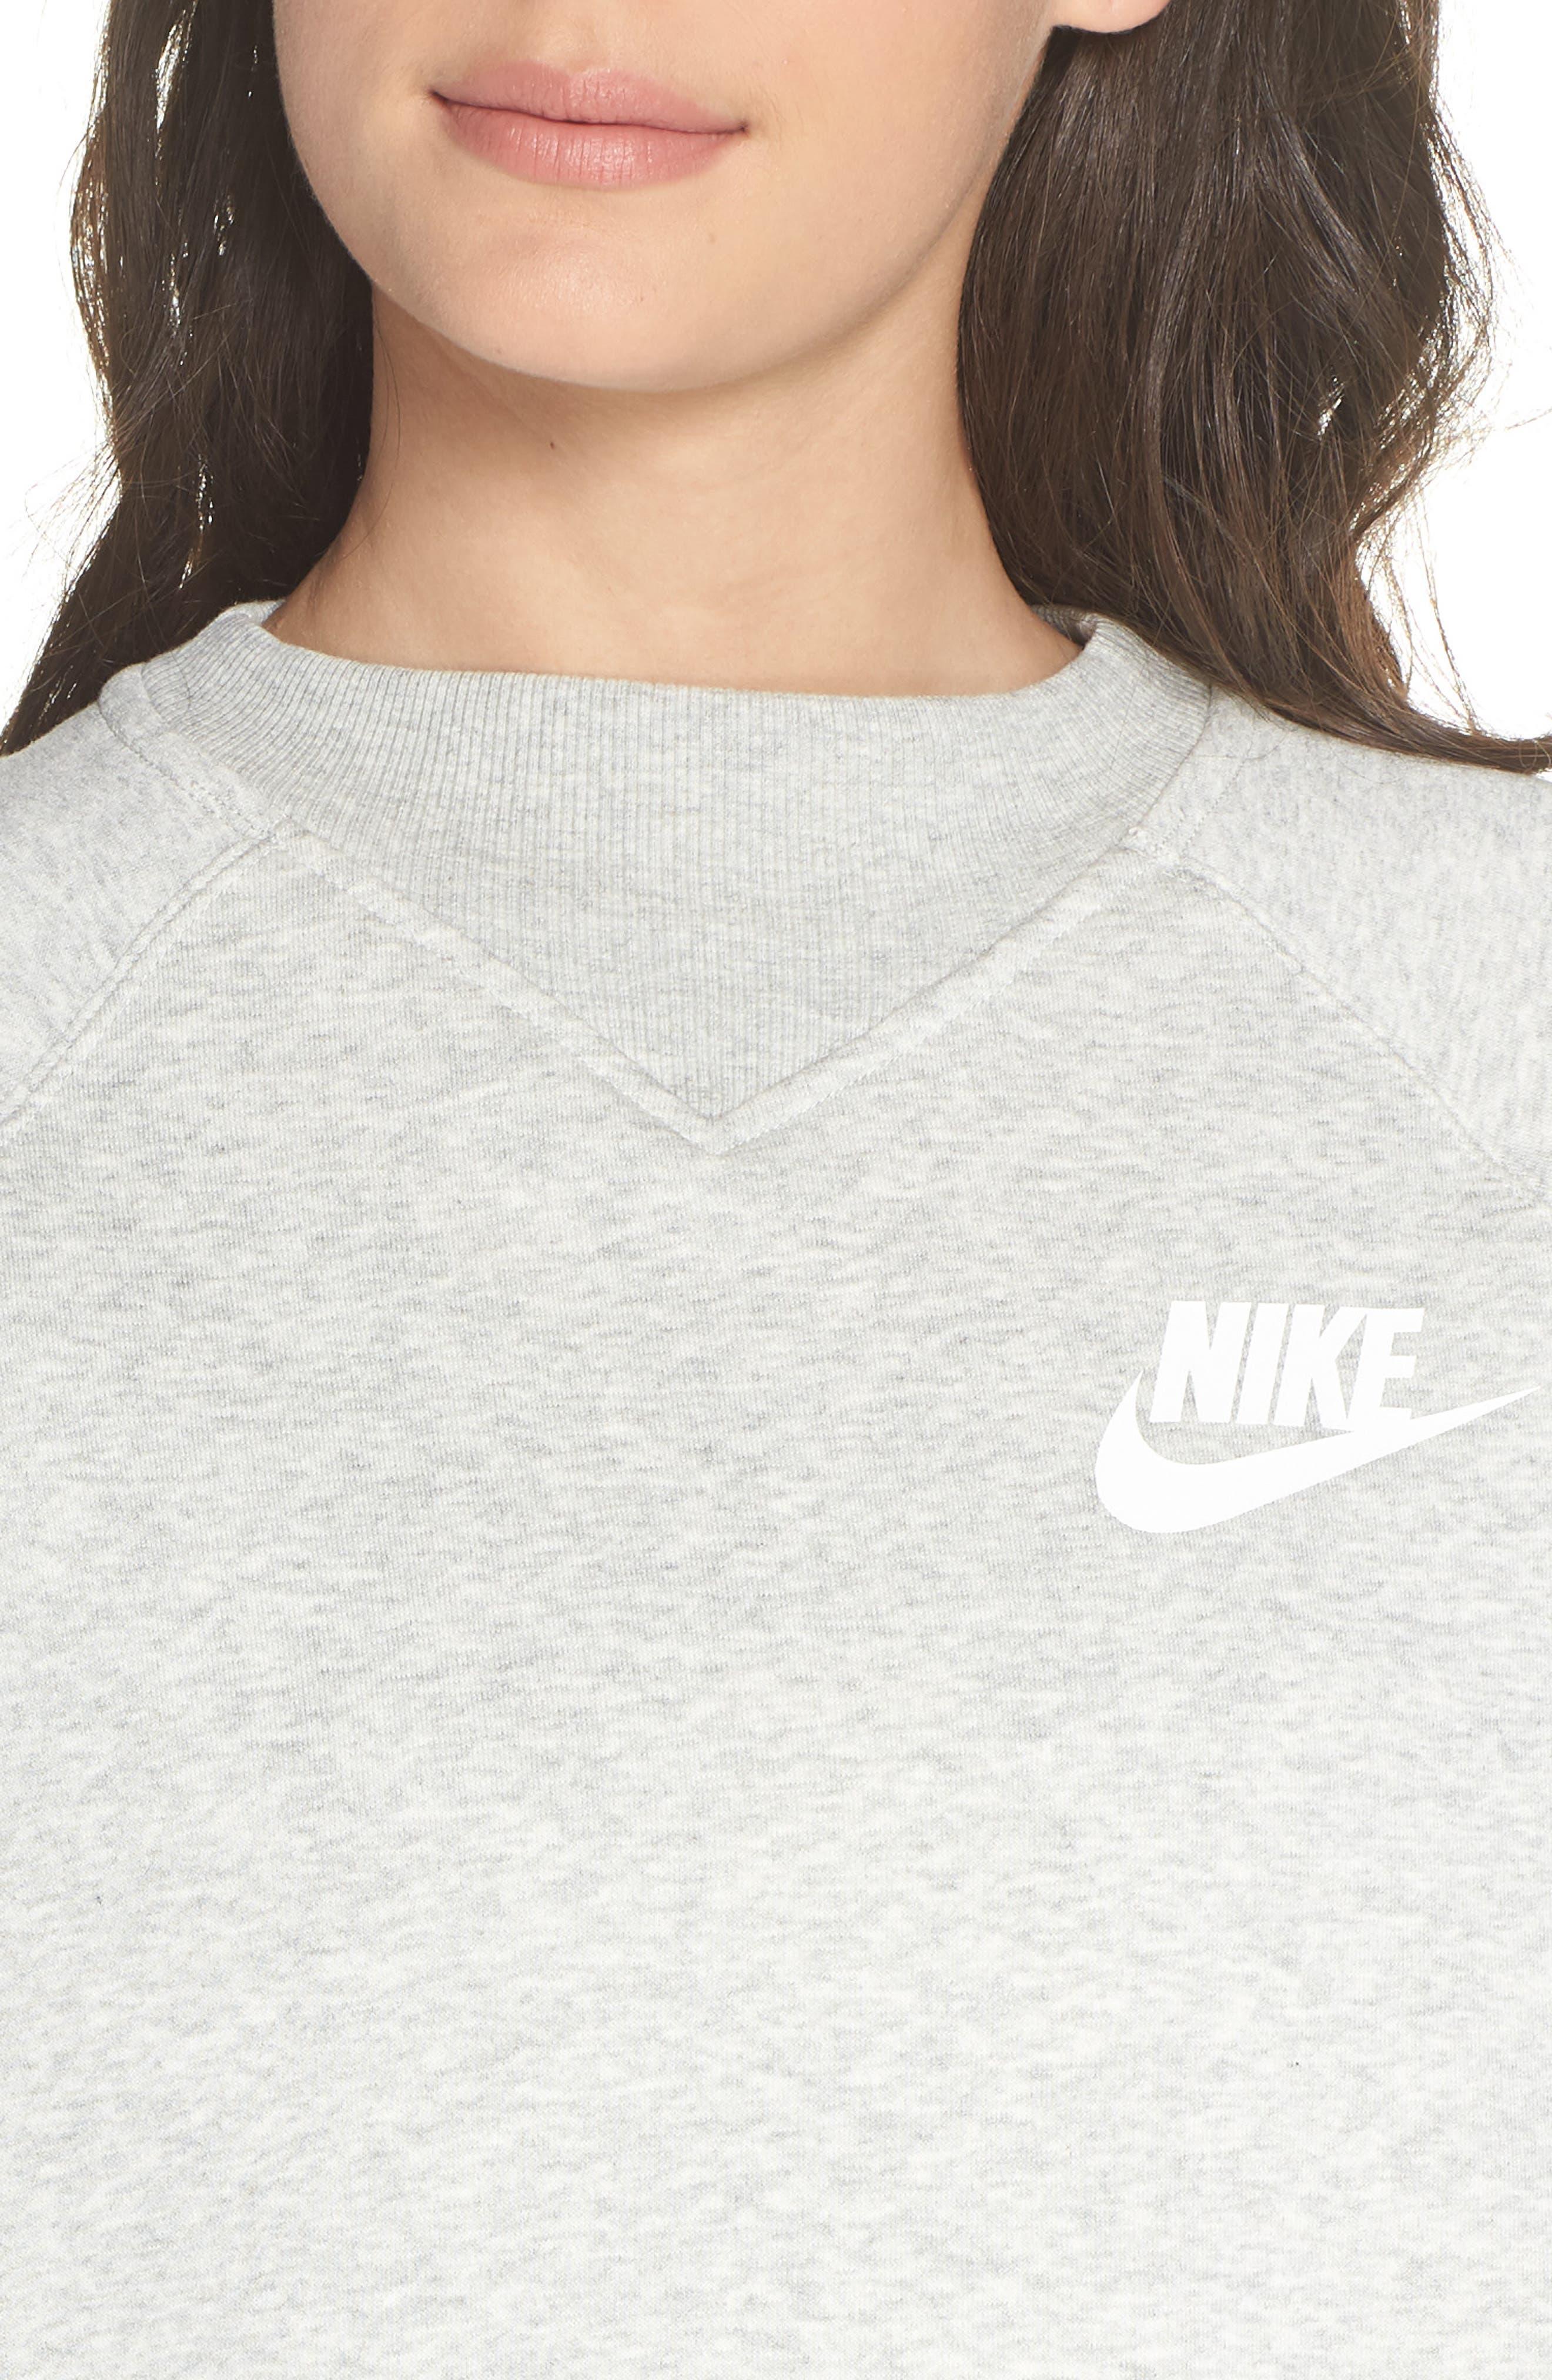 Sportswear Rally Sweatshirt,                             Alternate thumbnail 4, color,                             GREY HEATHER/ WHITE